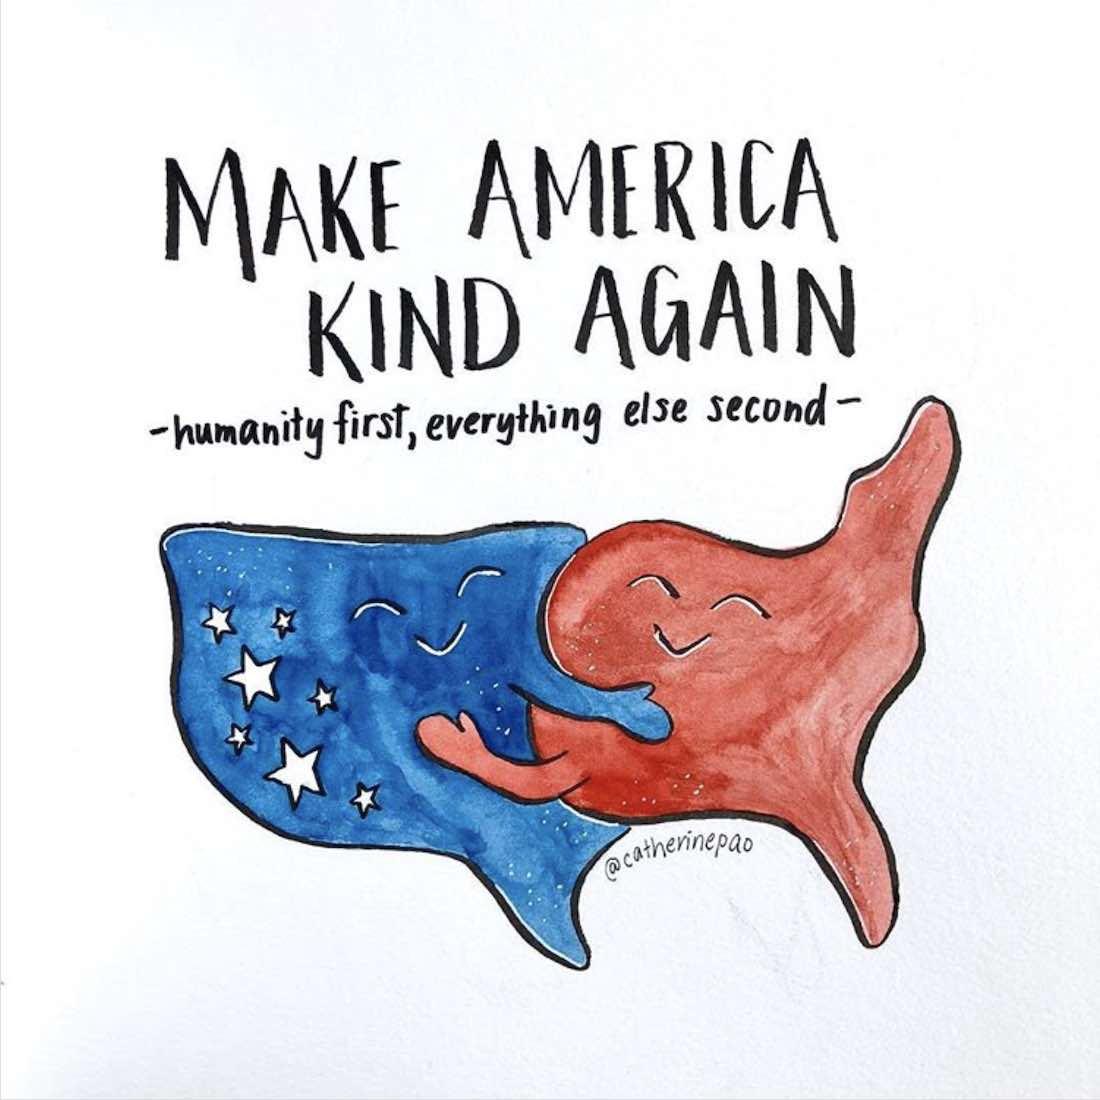 MAKE AMERICA KIND AGAIN by Catherine Pao